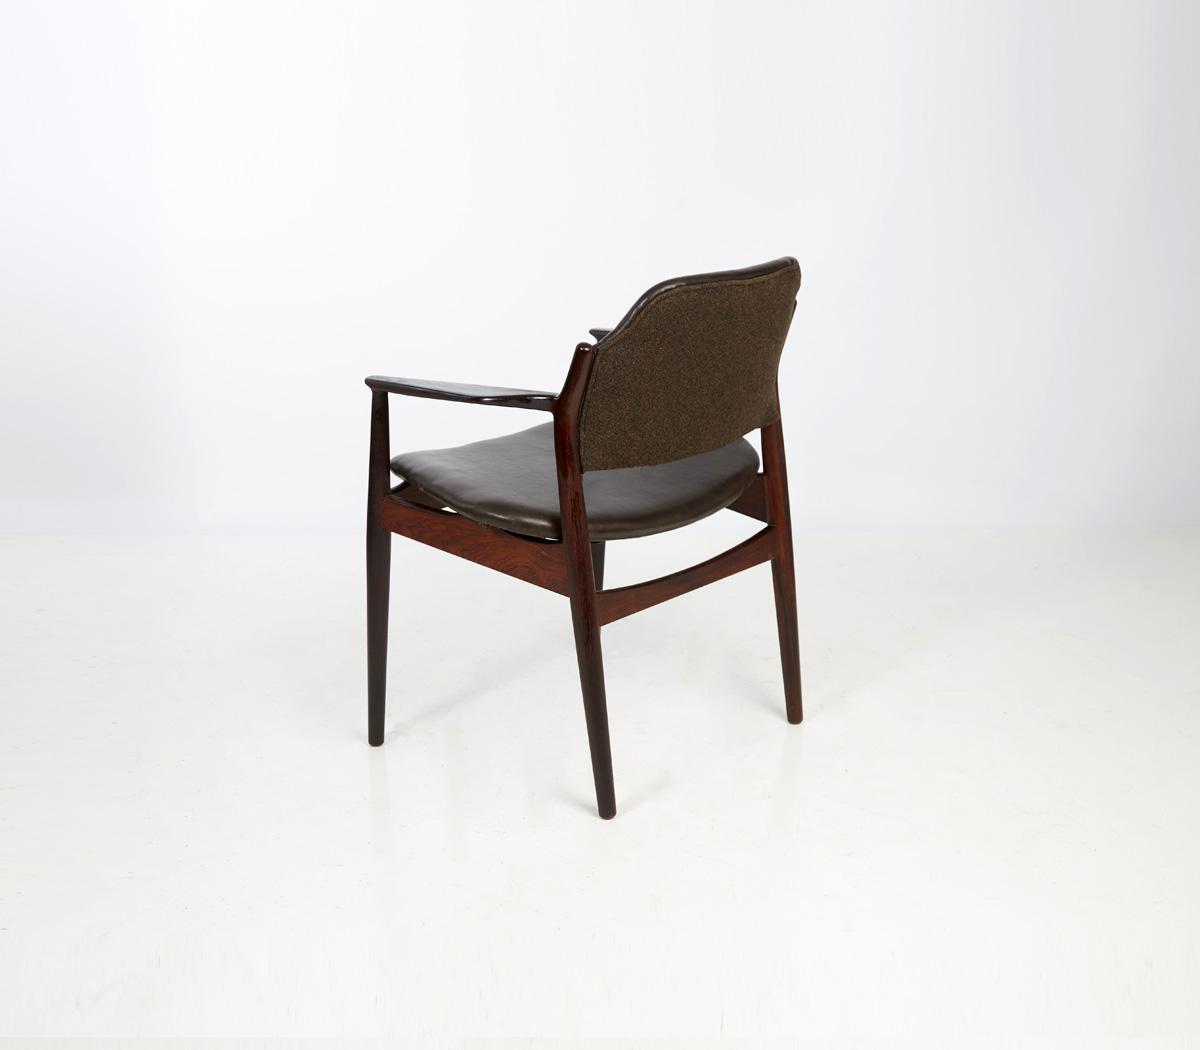 fauteuil de bureau scandinave arne vodder galerie assi. Black Bedroom Furniture Sets. Home Design Ideas